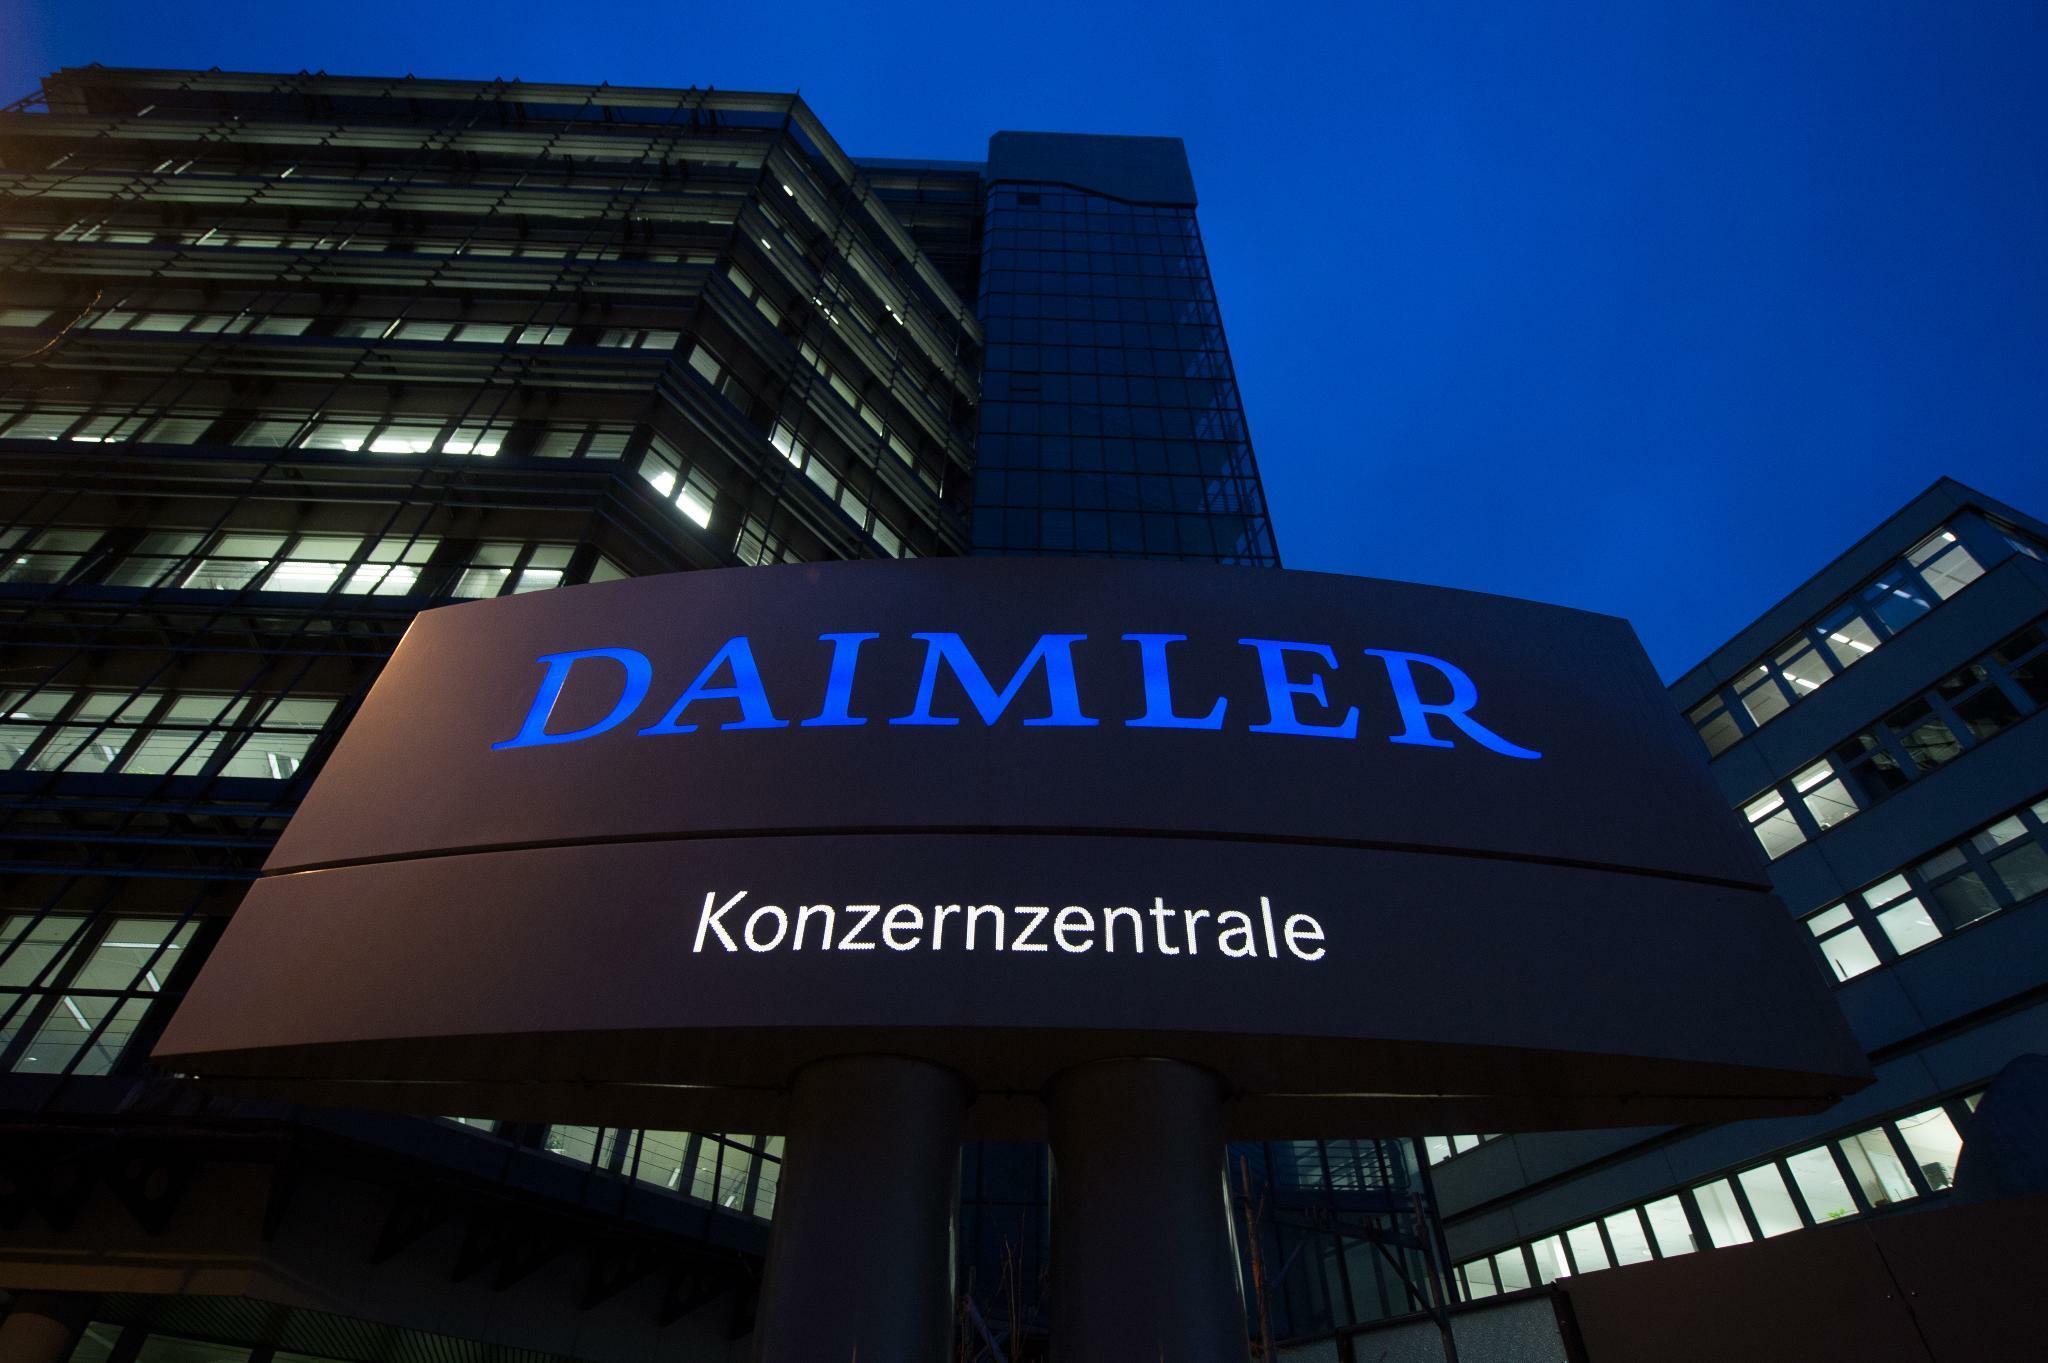 Dieselskandal: Daimler muss 870 Millionen Euro Bußgeld zahlen